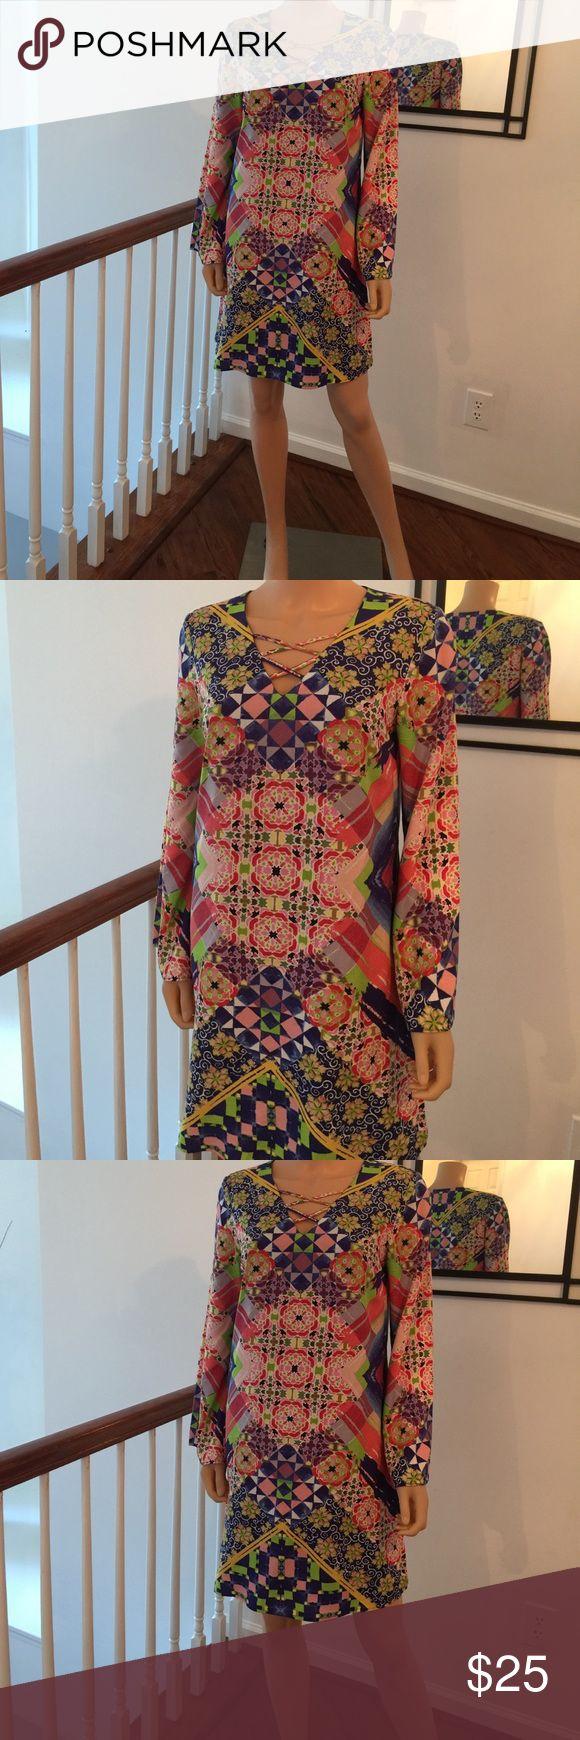 Elegant multi color dress Elegant multi color dress New York & Company Dresses